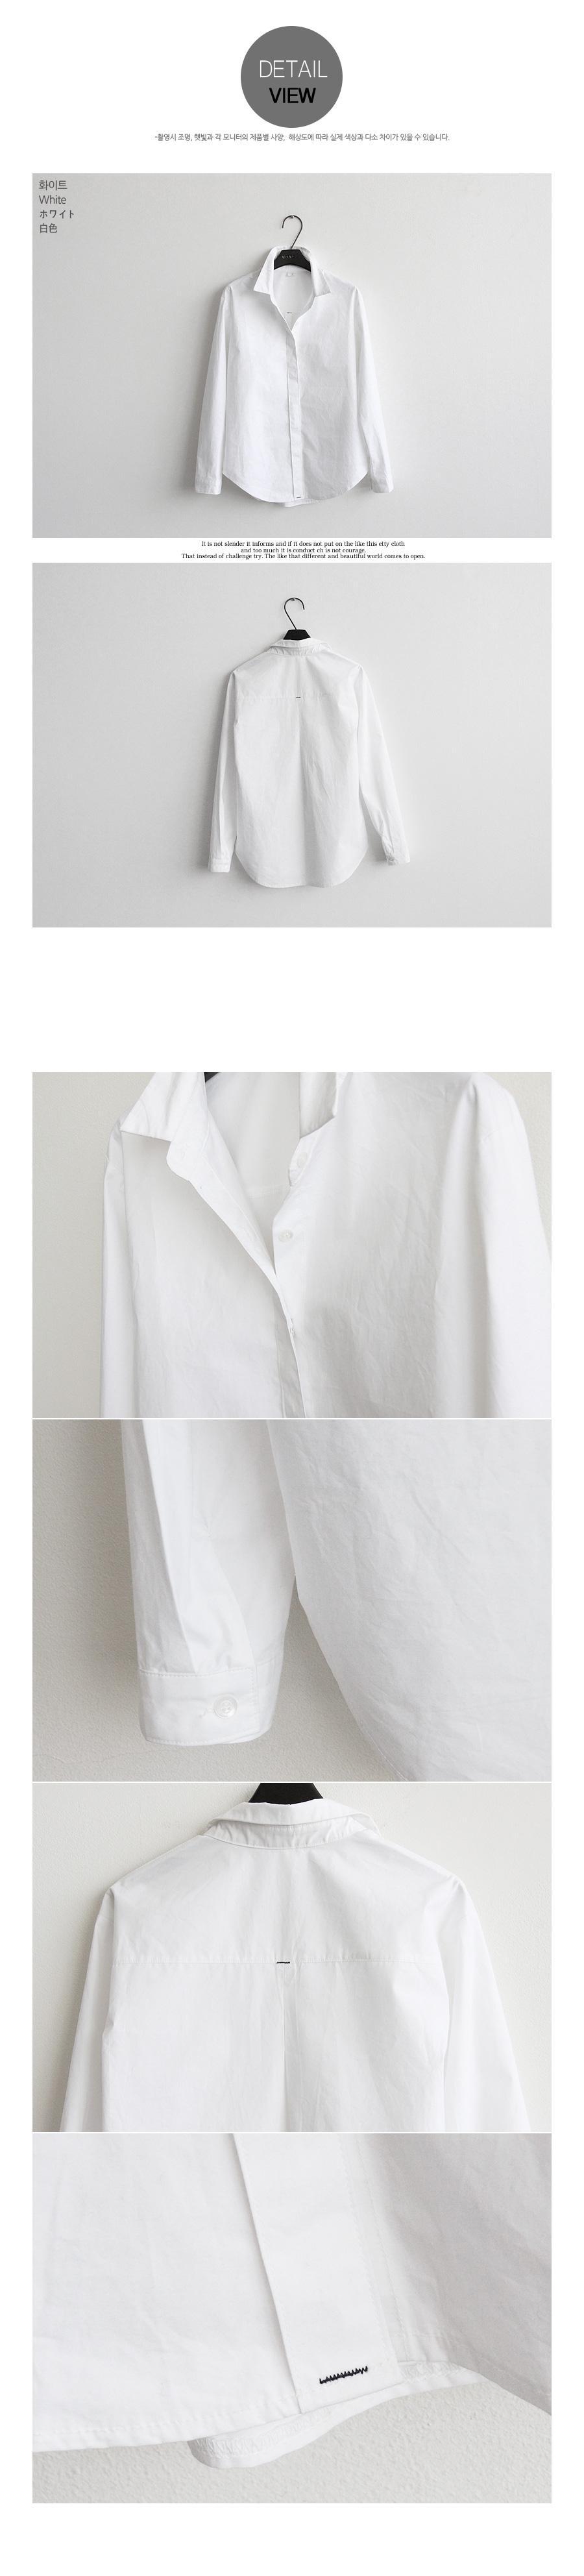 2014naning9韩国代购文艺范小清新白衬衫 女 长袖修身